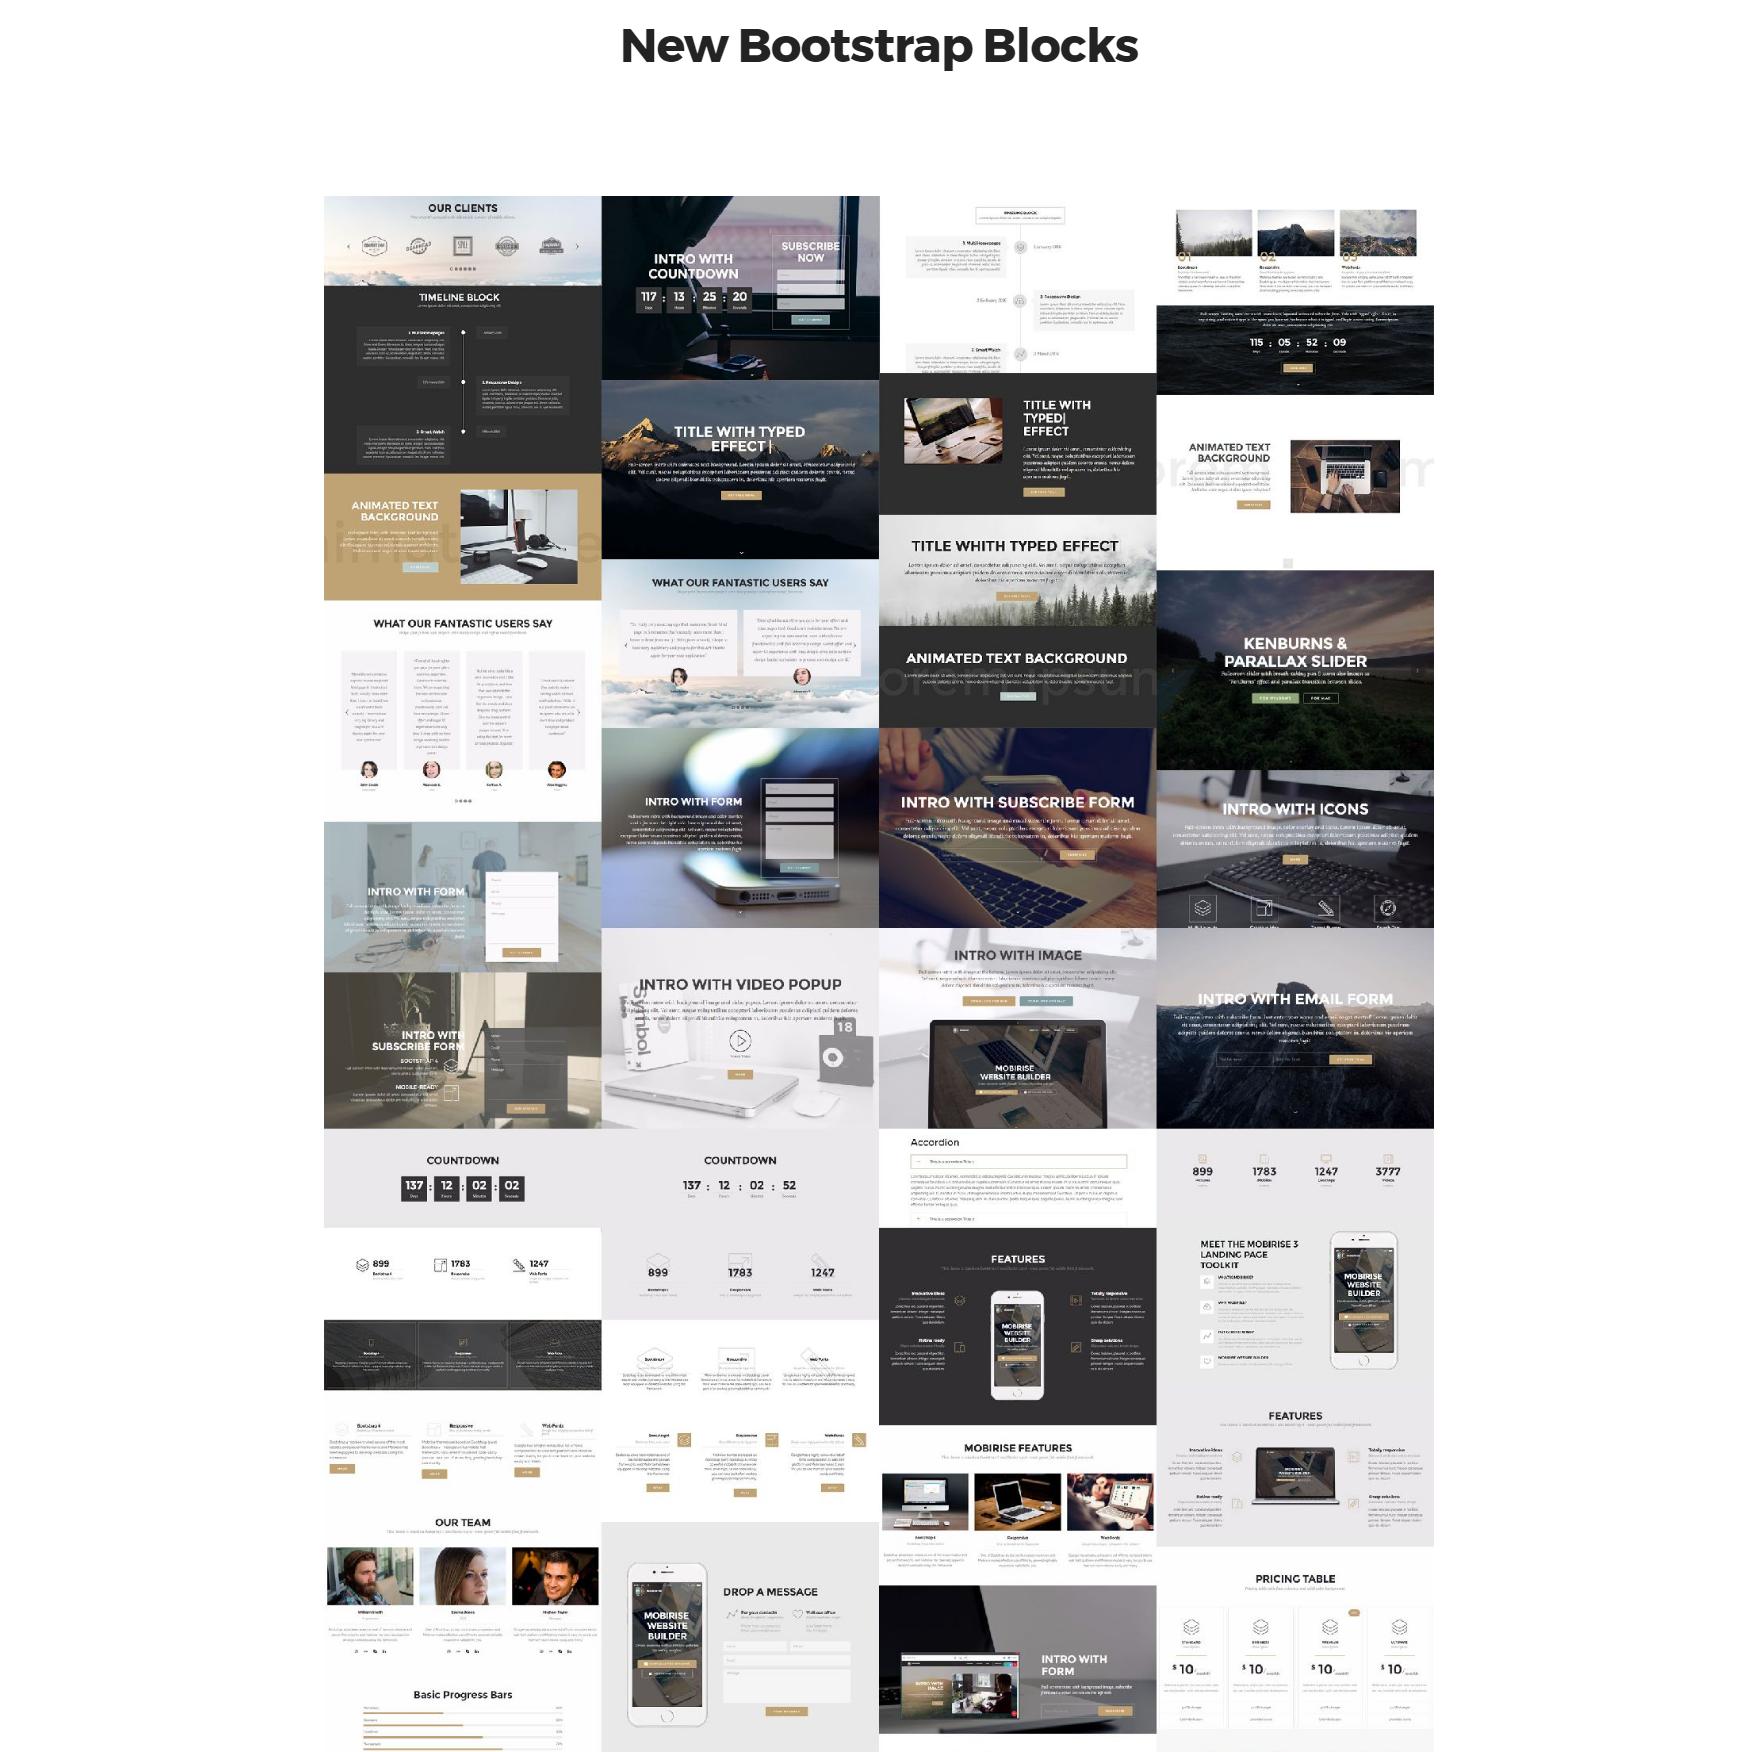 HTML Bootstrap 4 mobile-friendly blocks Templates